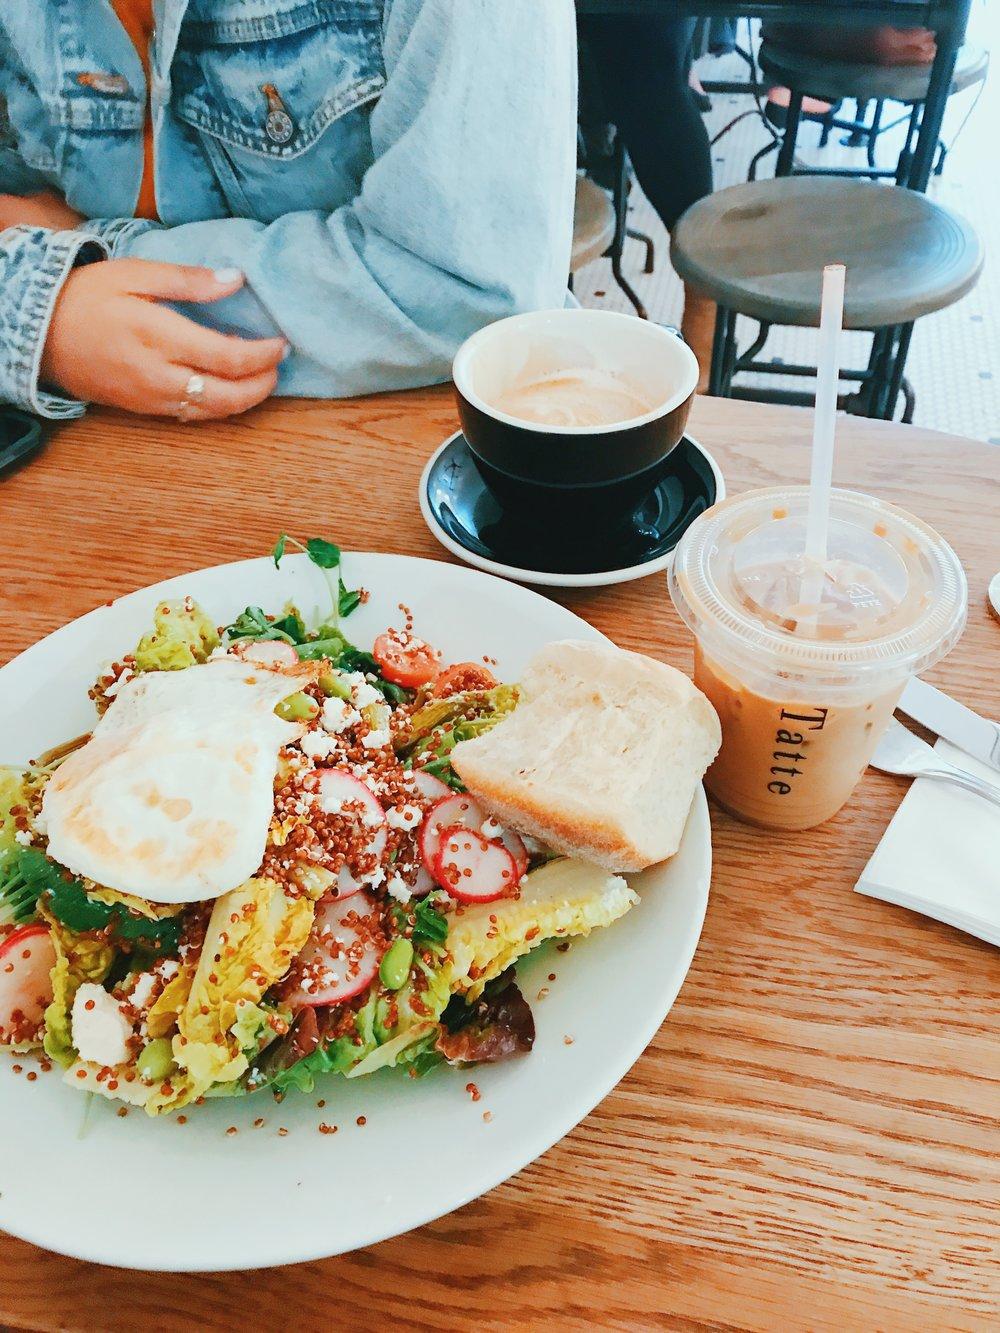 Tatte Bakery & Cafe Quinoa Veggie Bowl